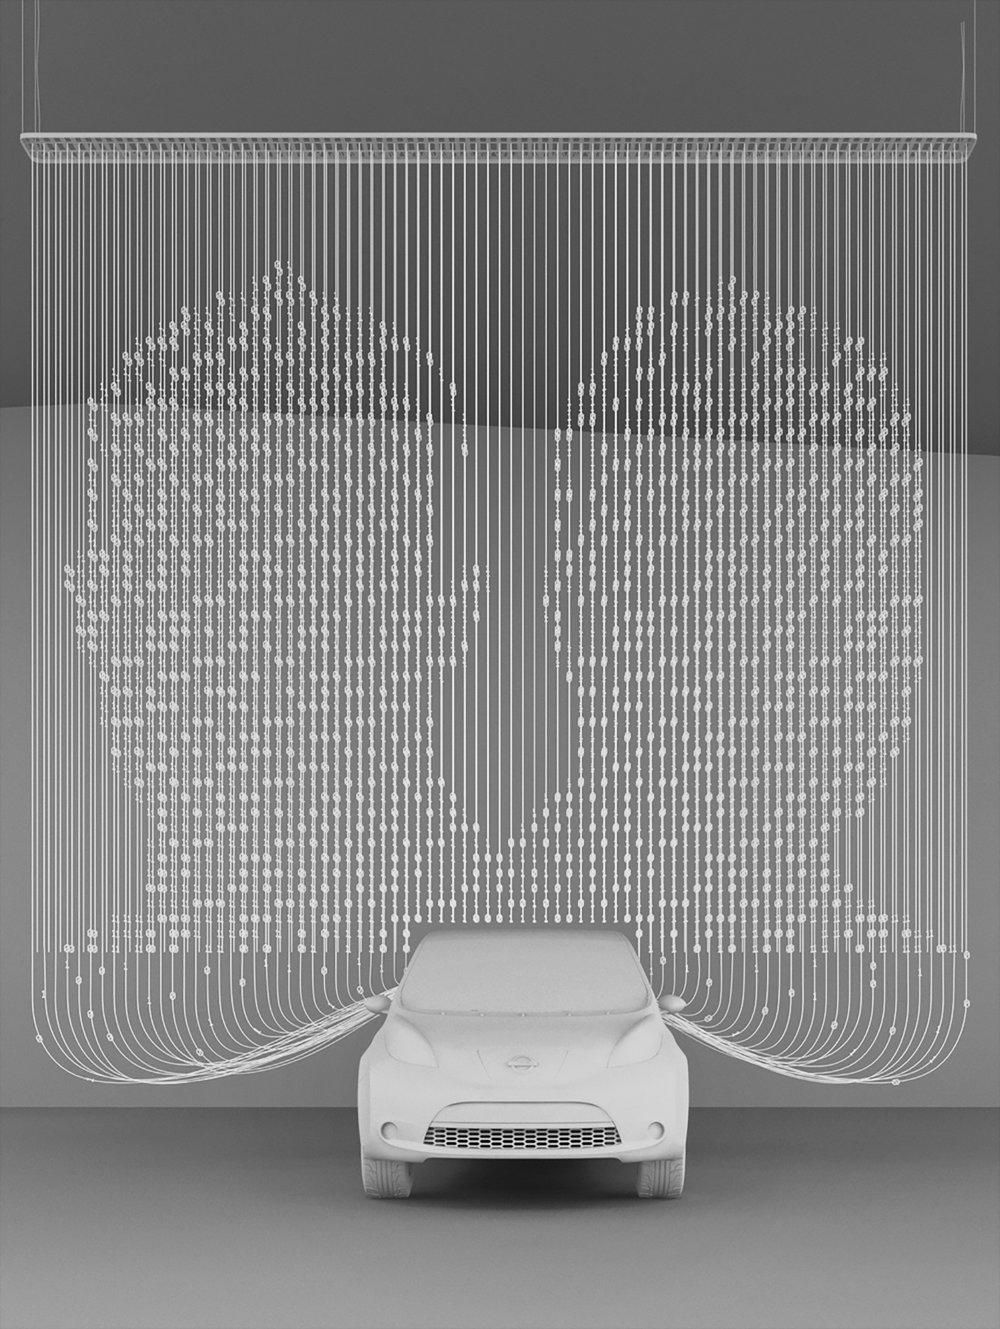 Grey_final_1500px.jpg